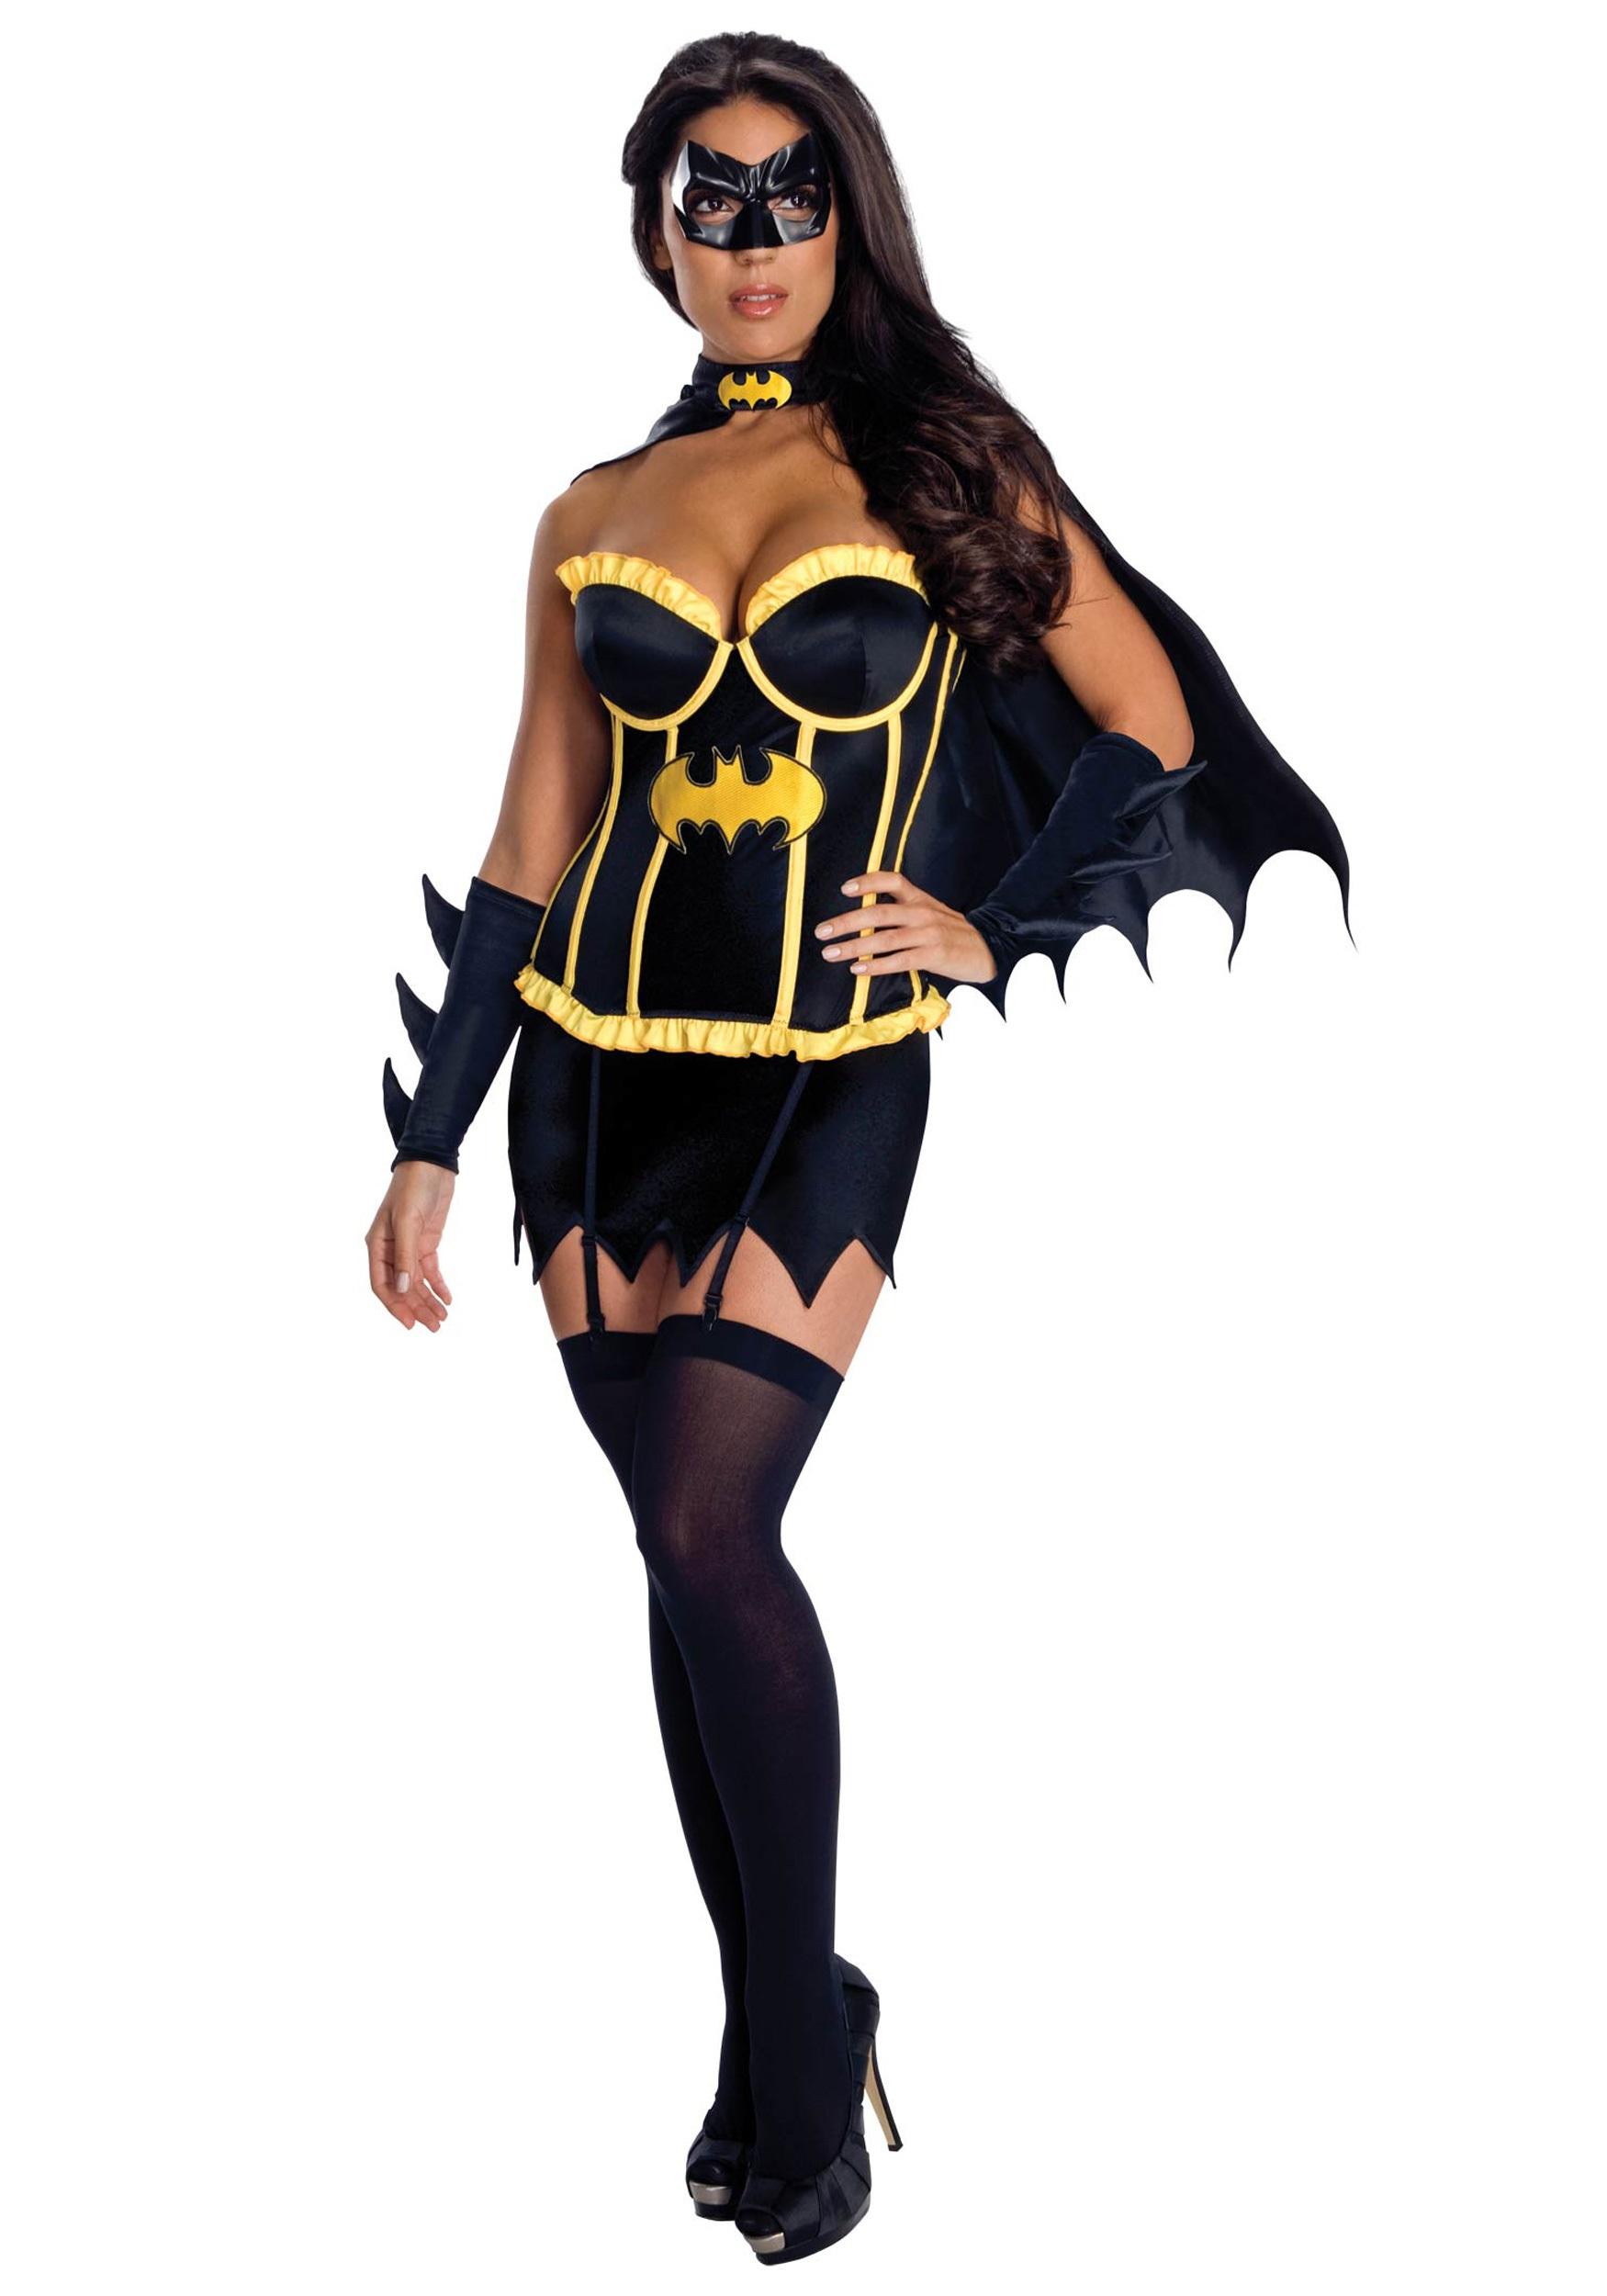 Batgirl Corset CostumeBatgirl Costumes